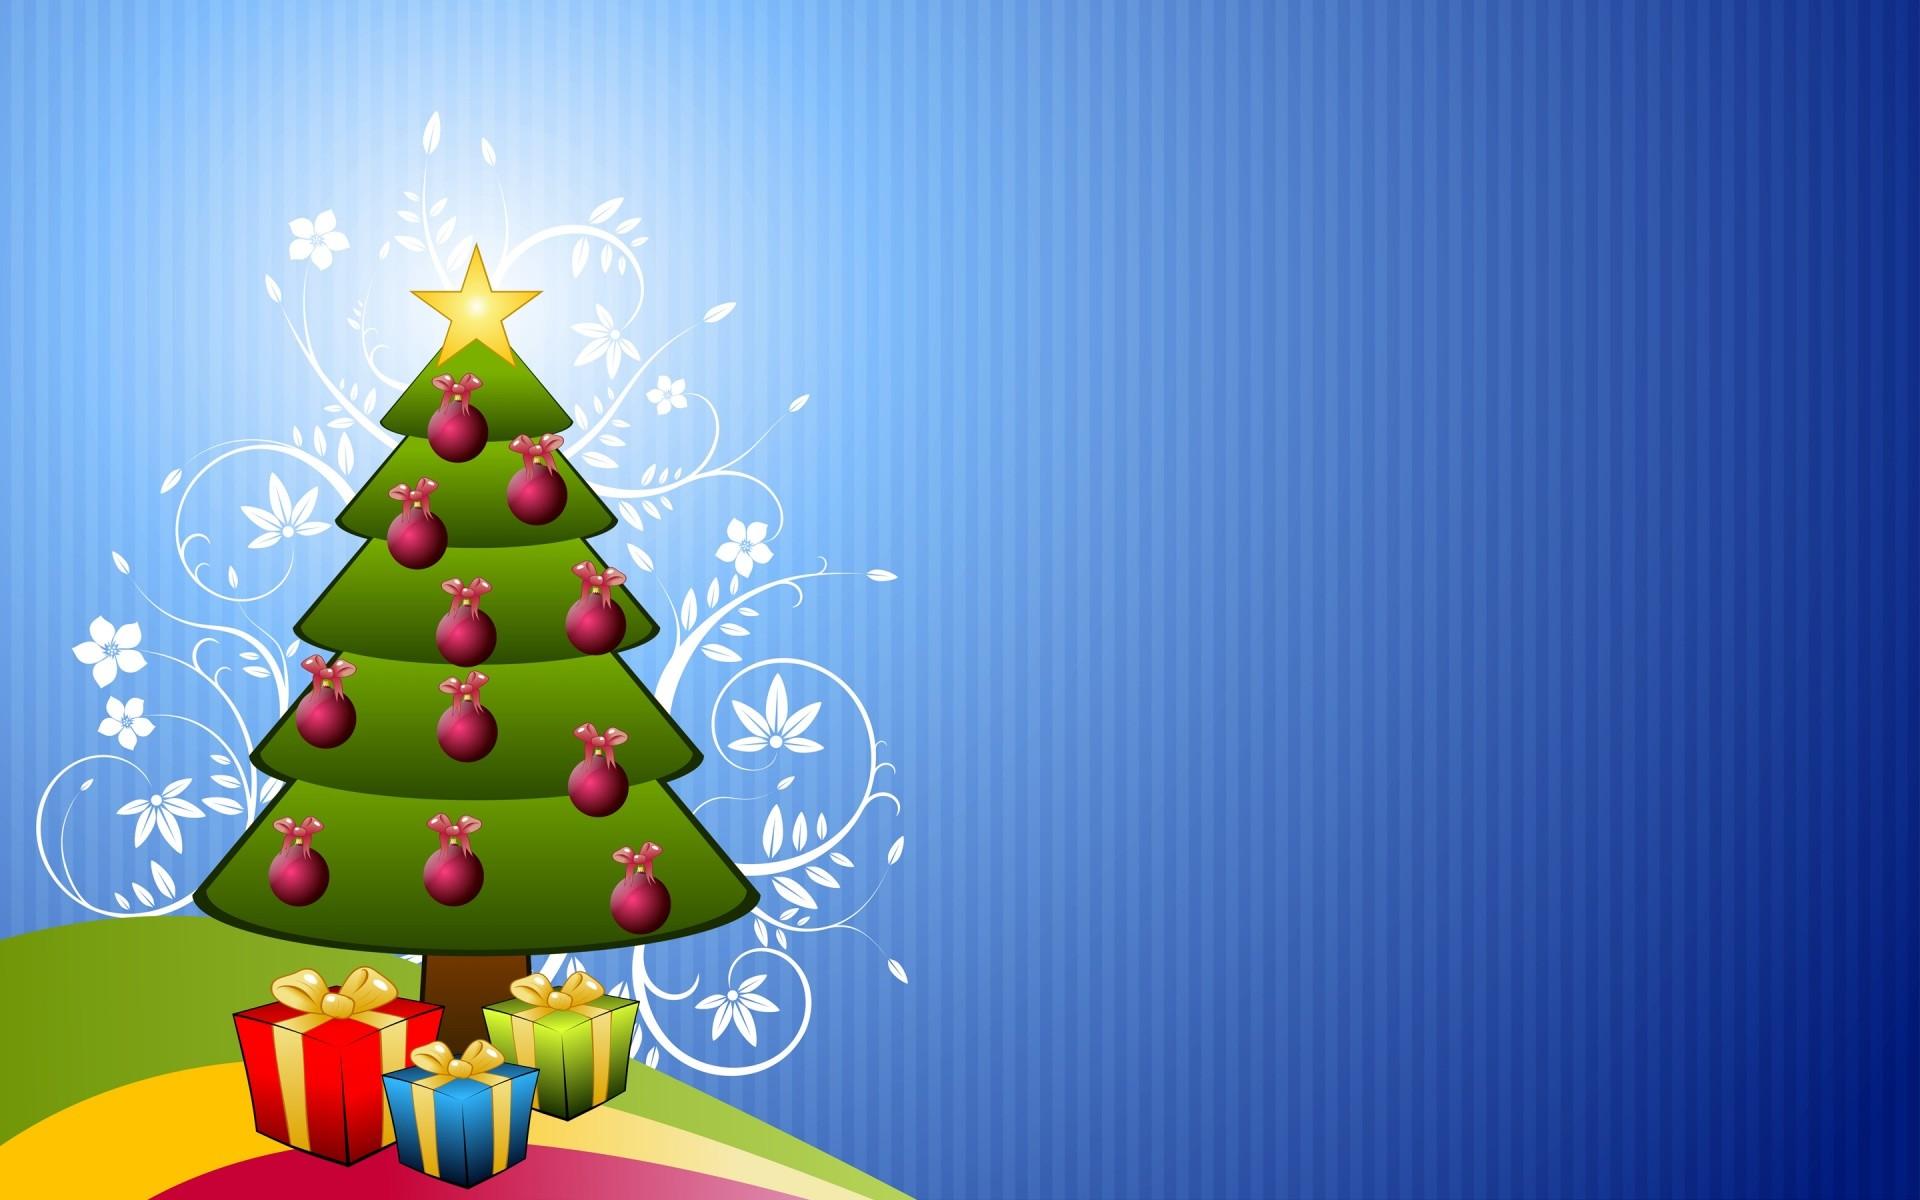 2015 Christmas wallpaper background